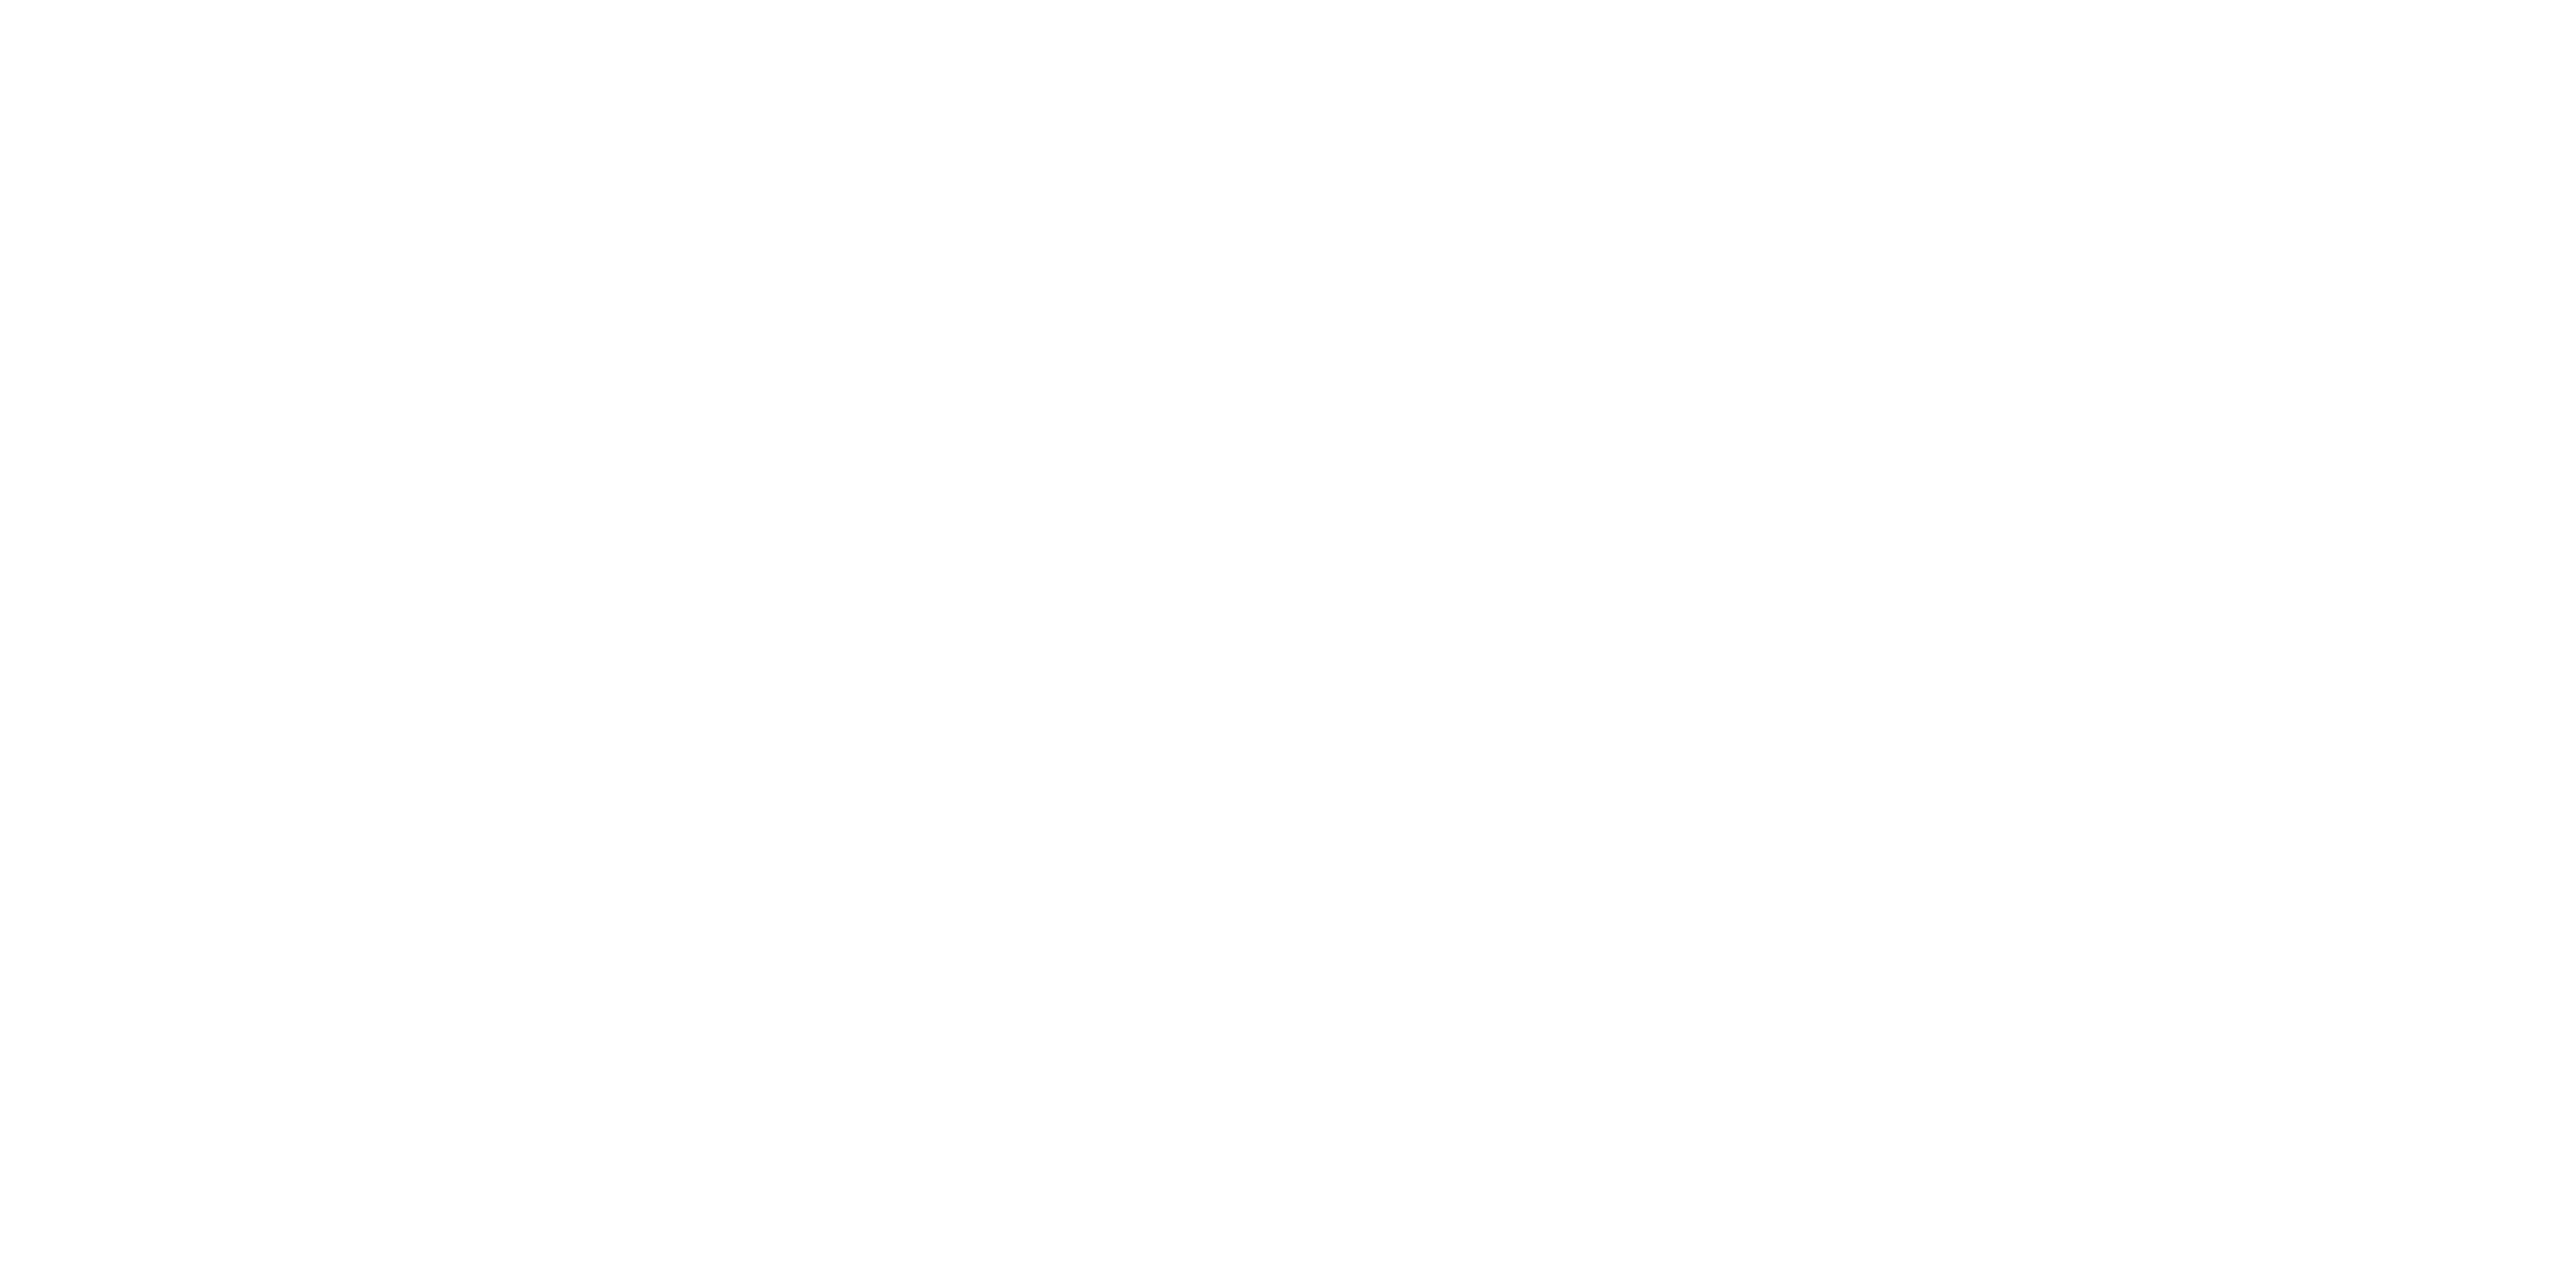 Silhouette Tng Titan Next Generation Nylor (4337)